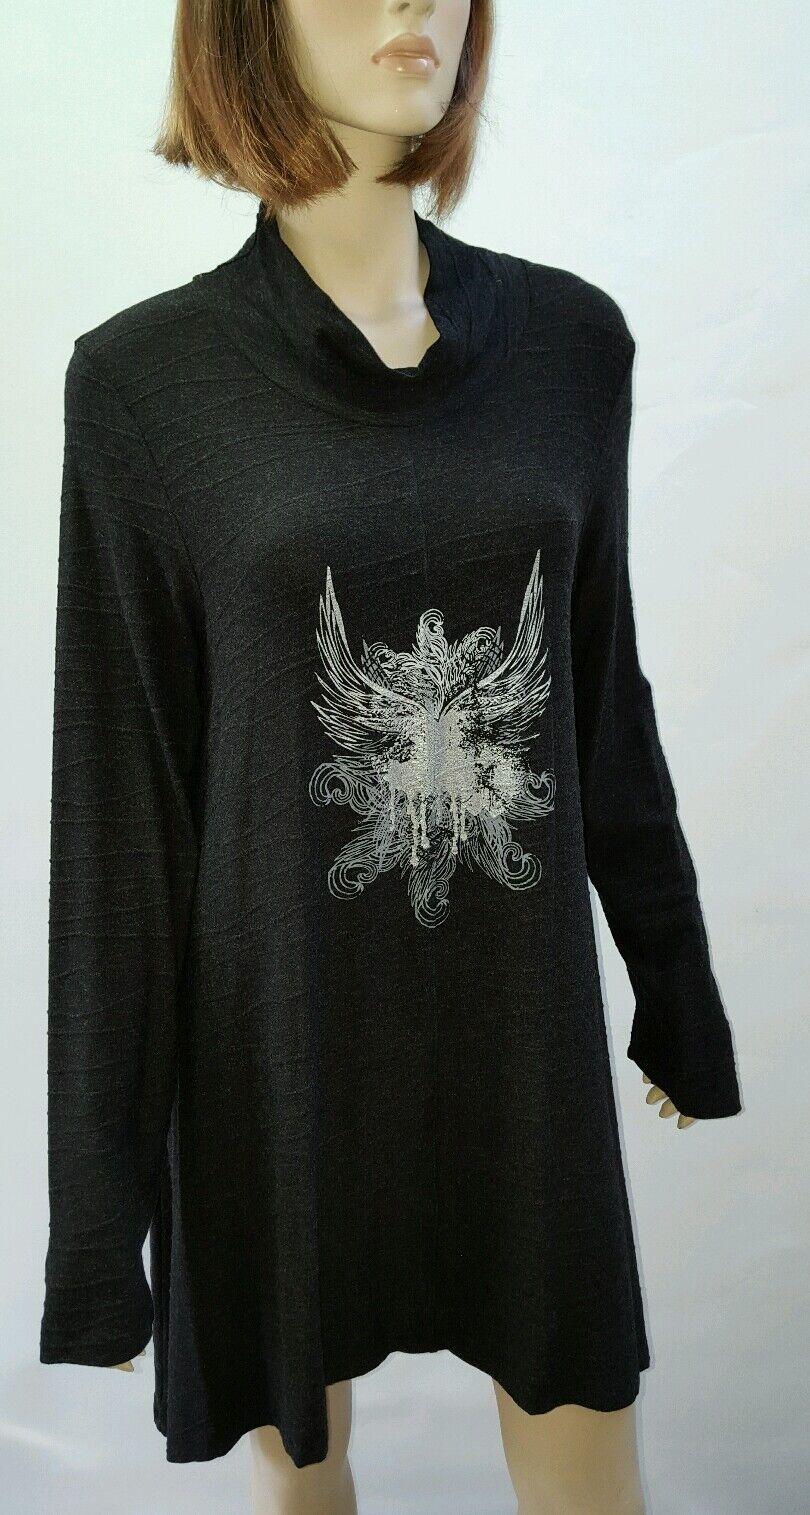 LAUREN VIDAL Größe XL 14 Designer Print Tunic Paris Luxury RRP  NEW w TAGS